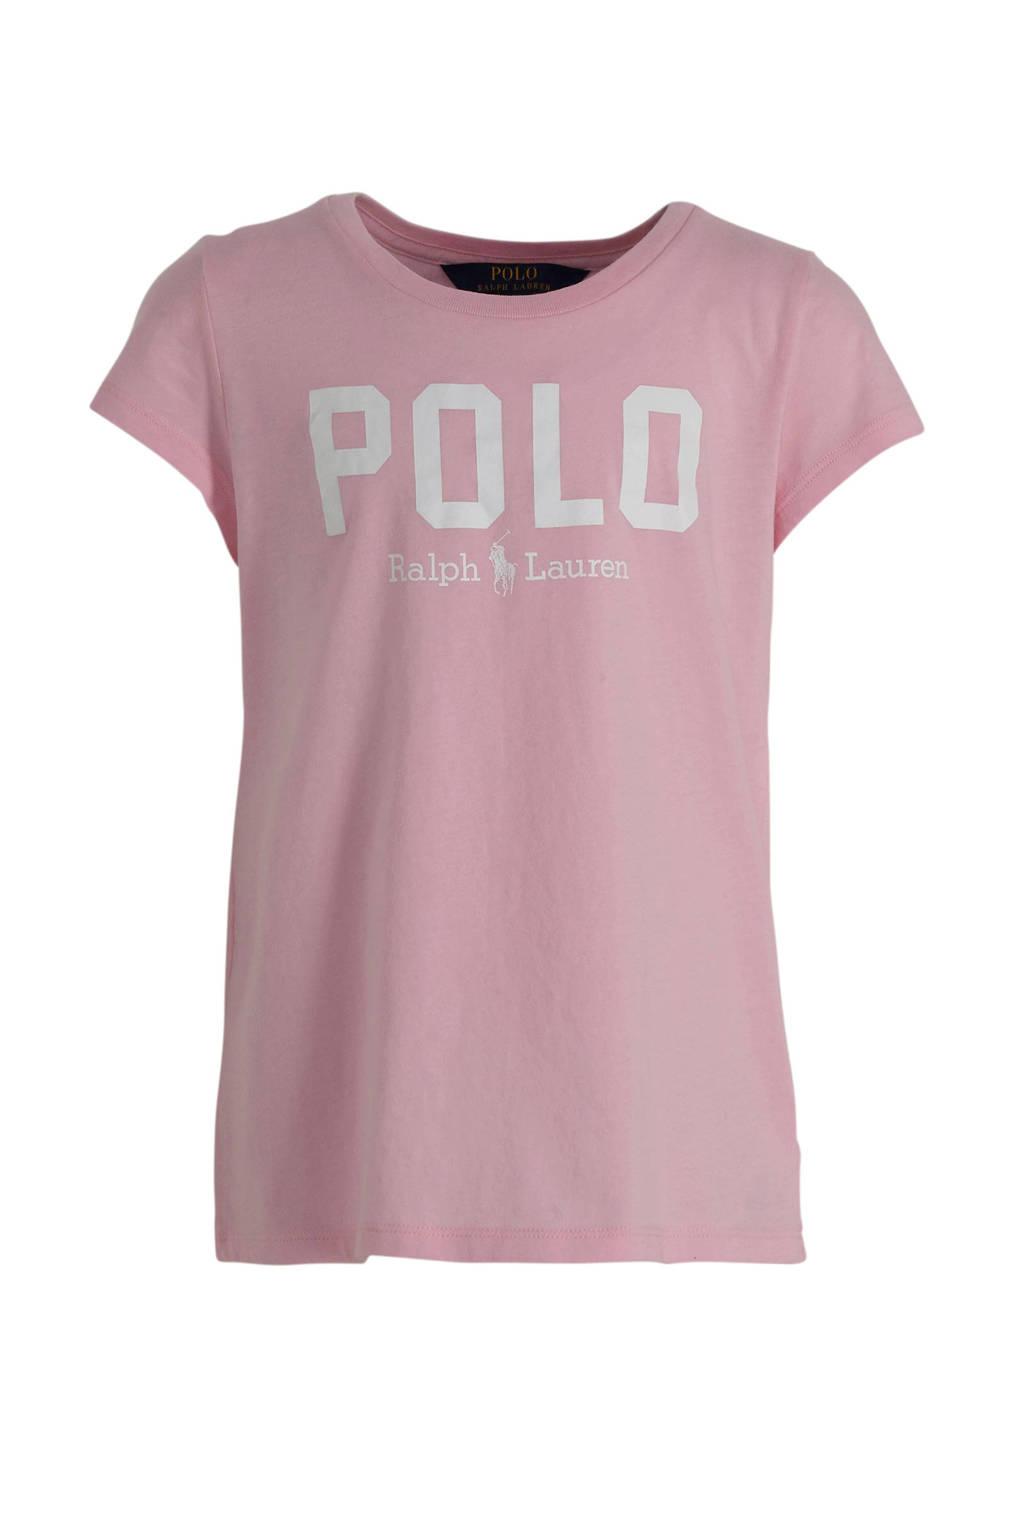 POLO Ralph Lauren T-shirt met logo lichtroze/wit, Lichtroze/wit